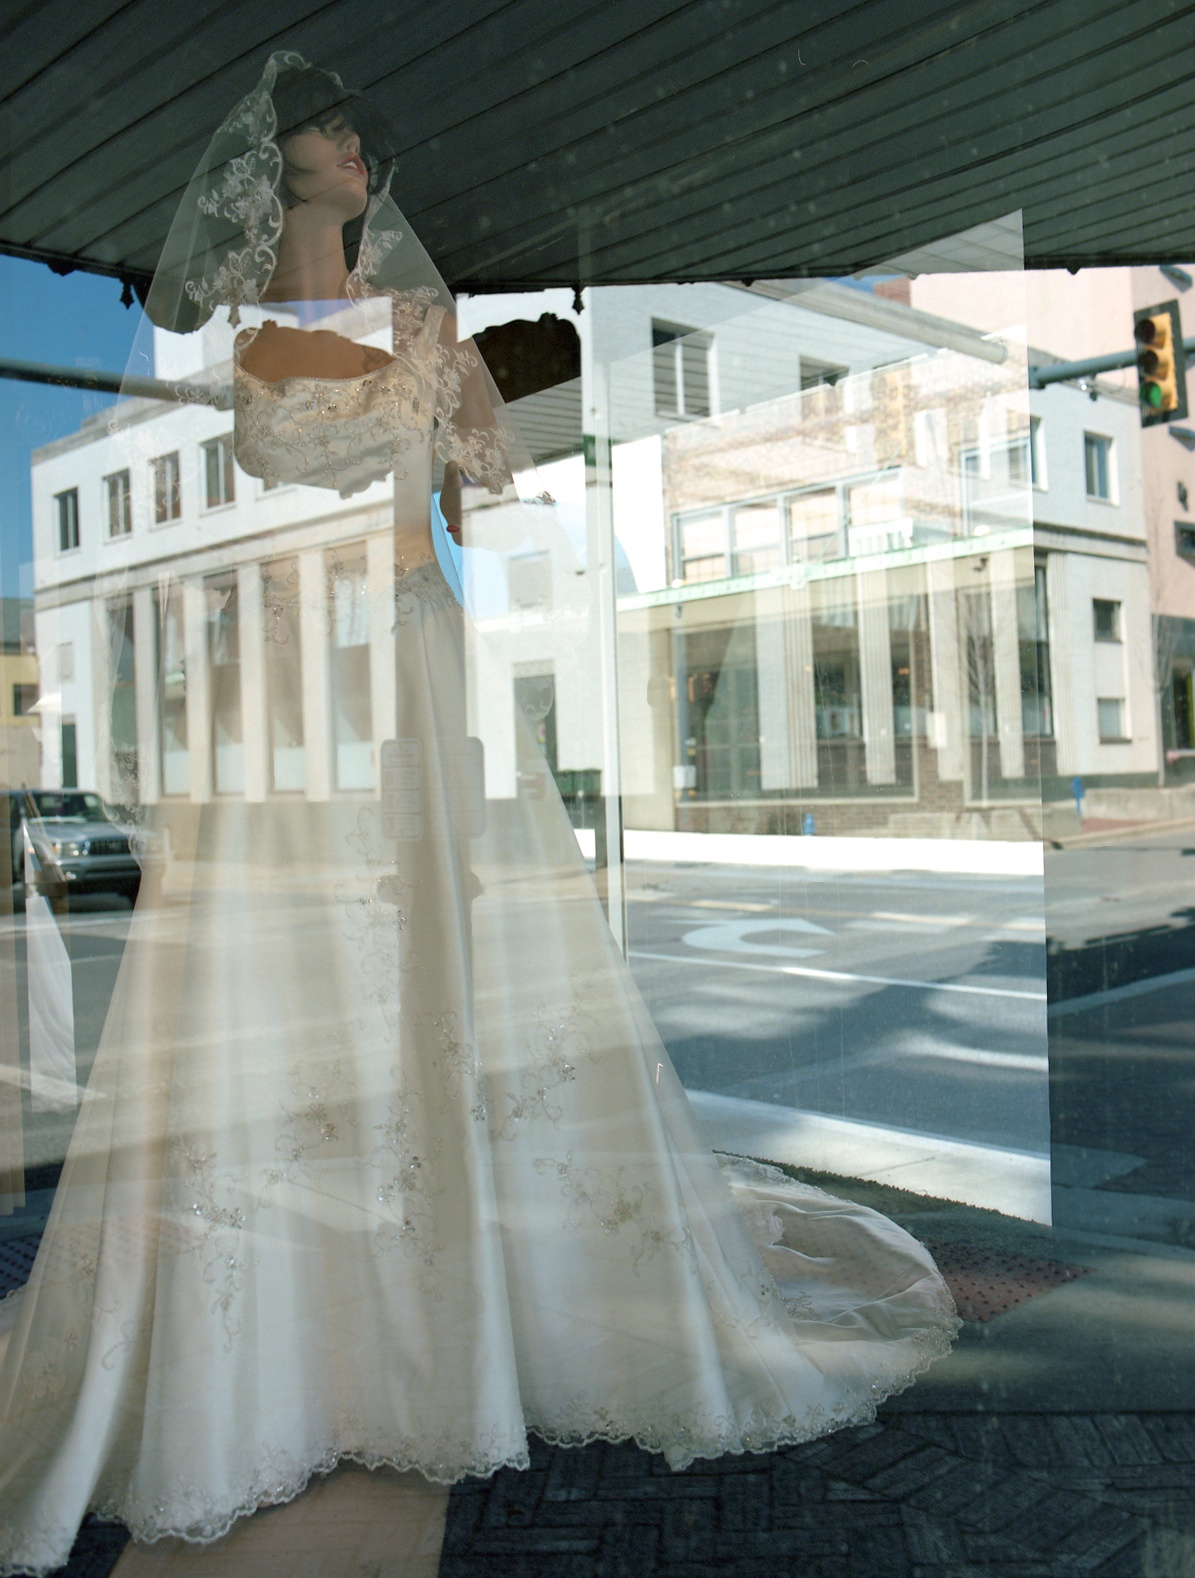 Massengill's Mannequin, Johnson City, TN. 2014.